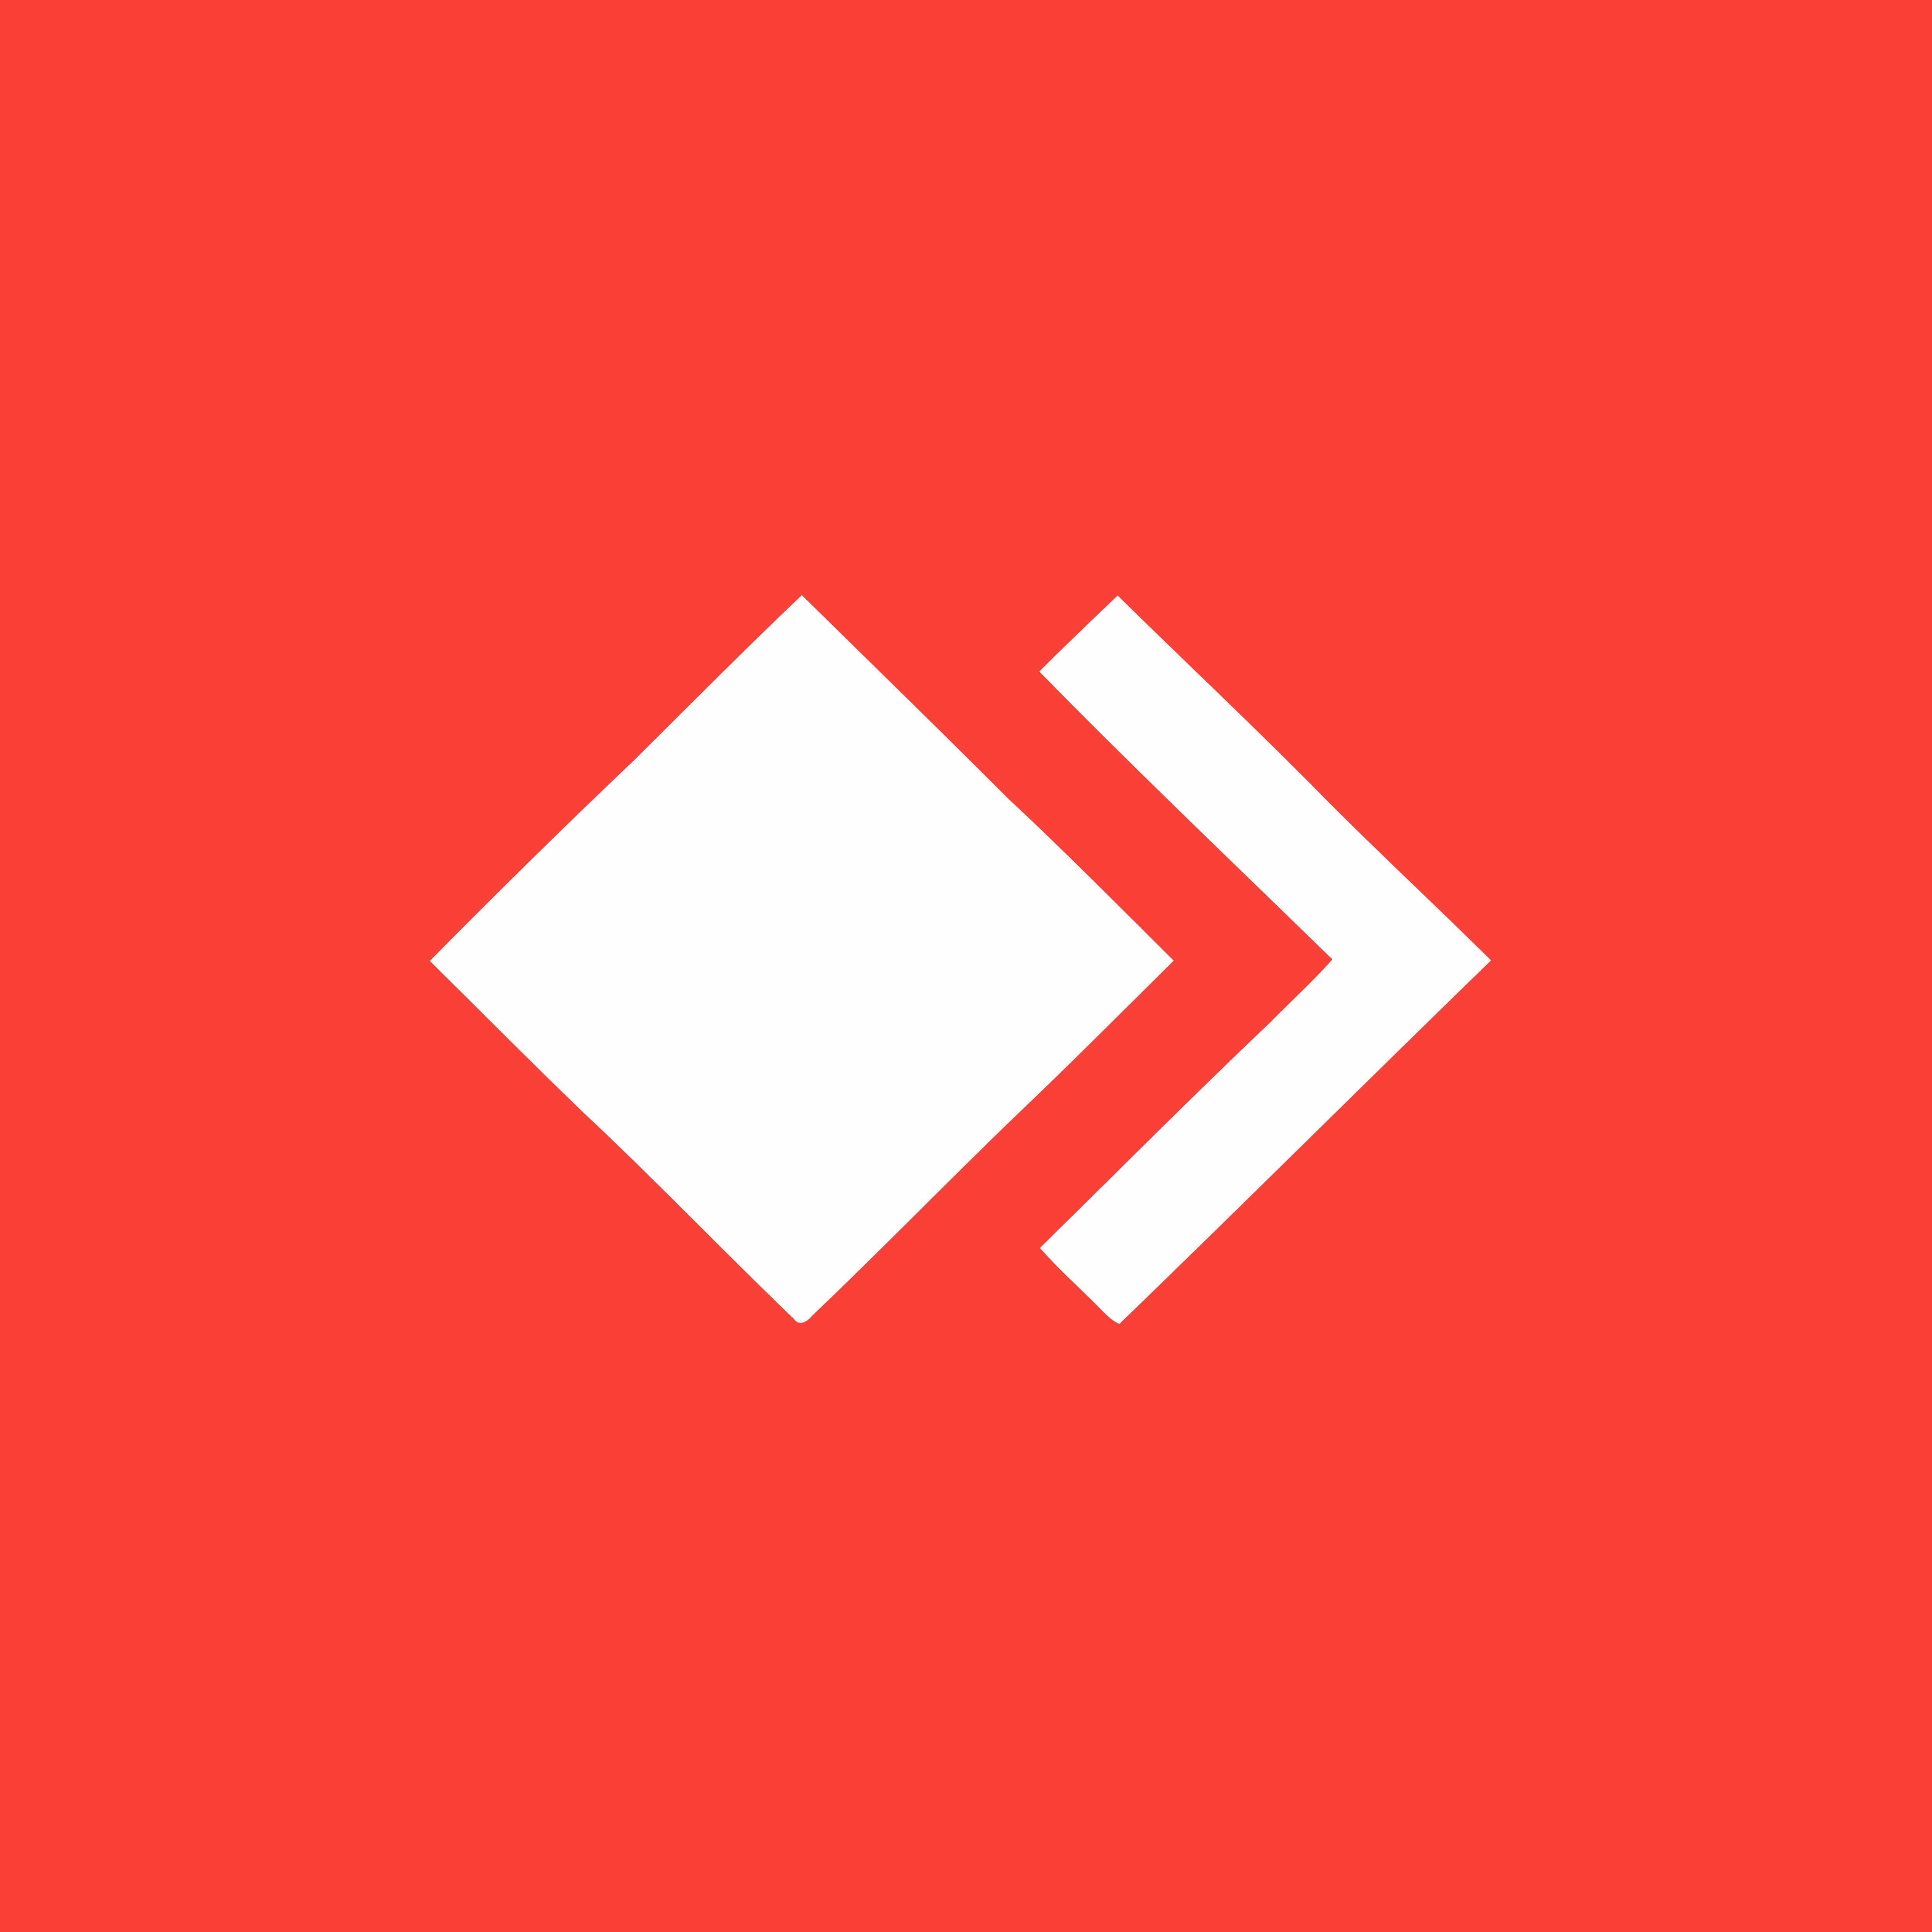 Anydesk Logos Download